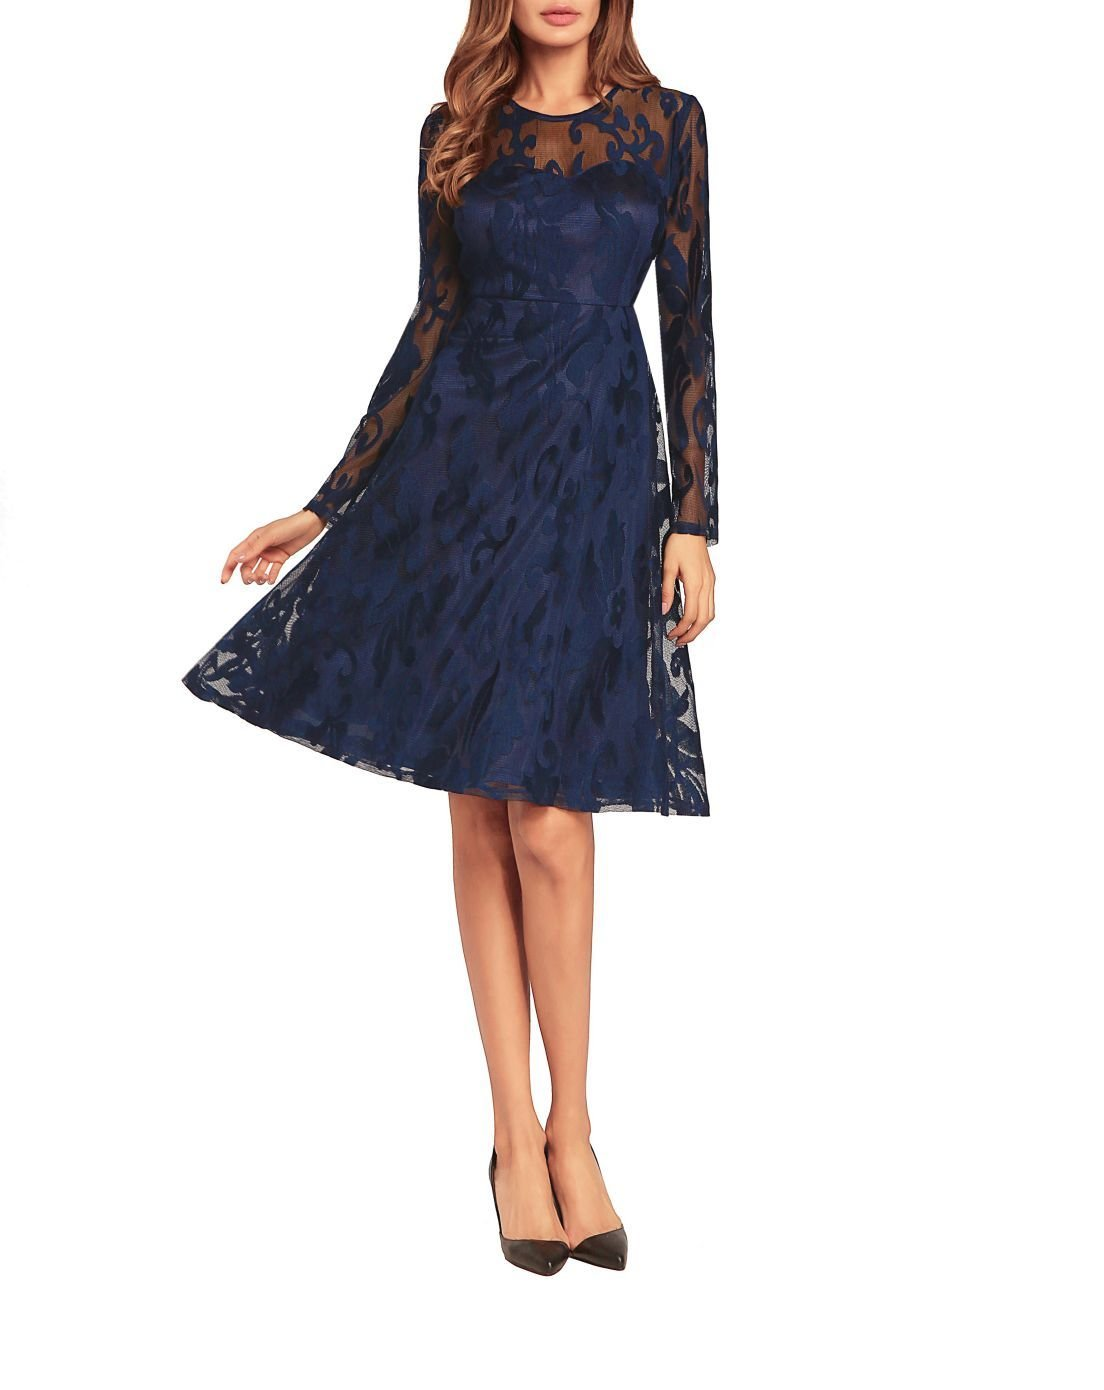 Vintage Hollow-Out Lace Dresses for Women